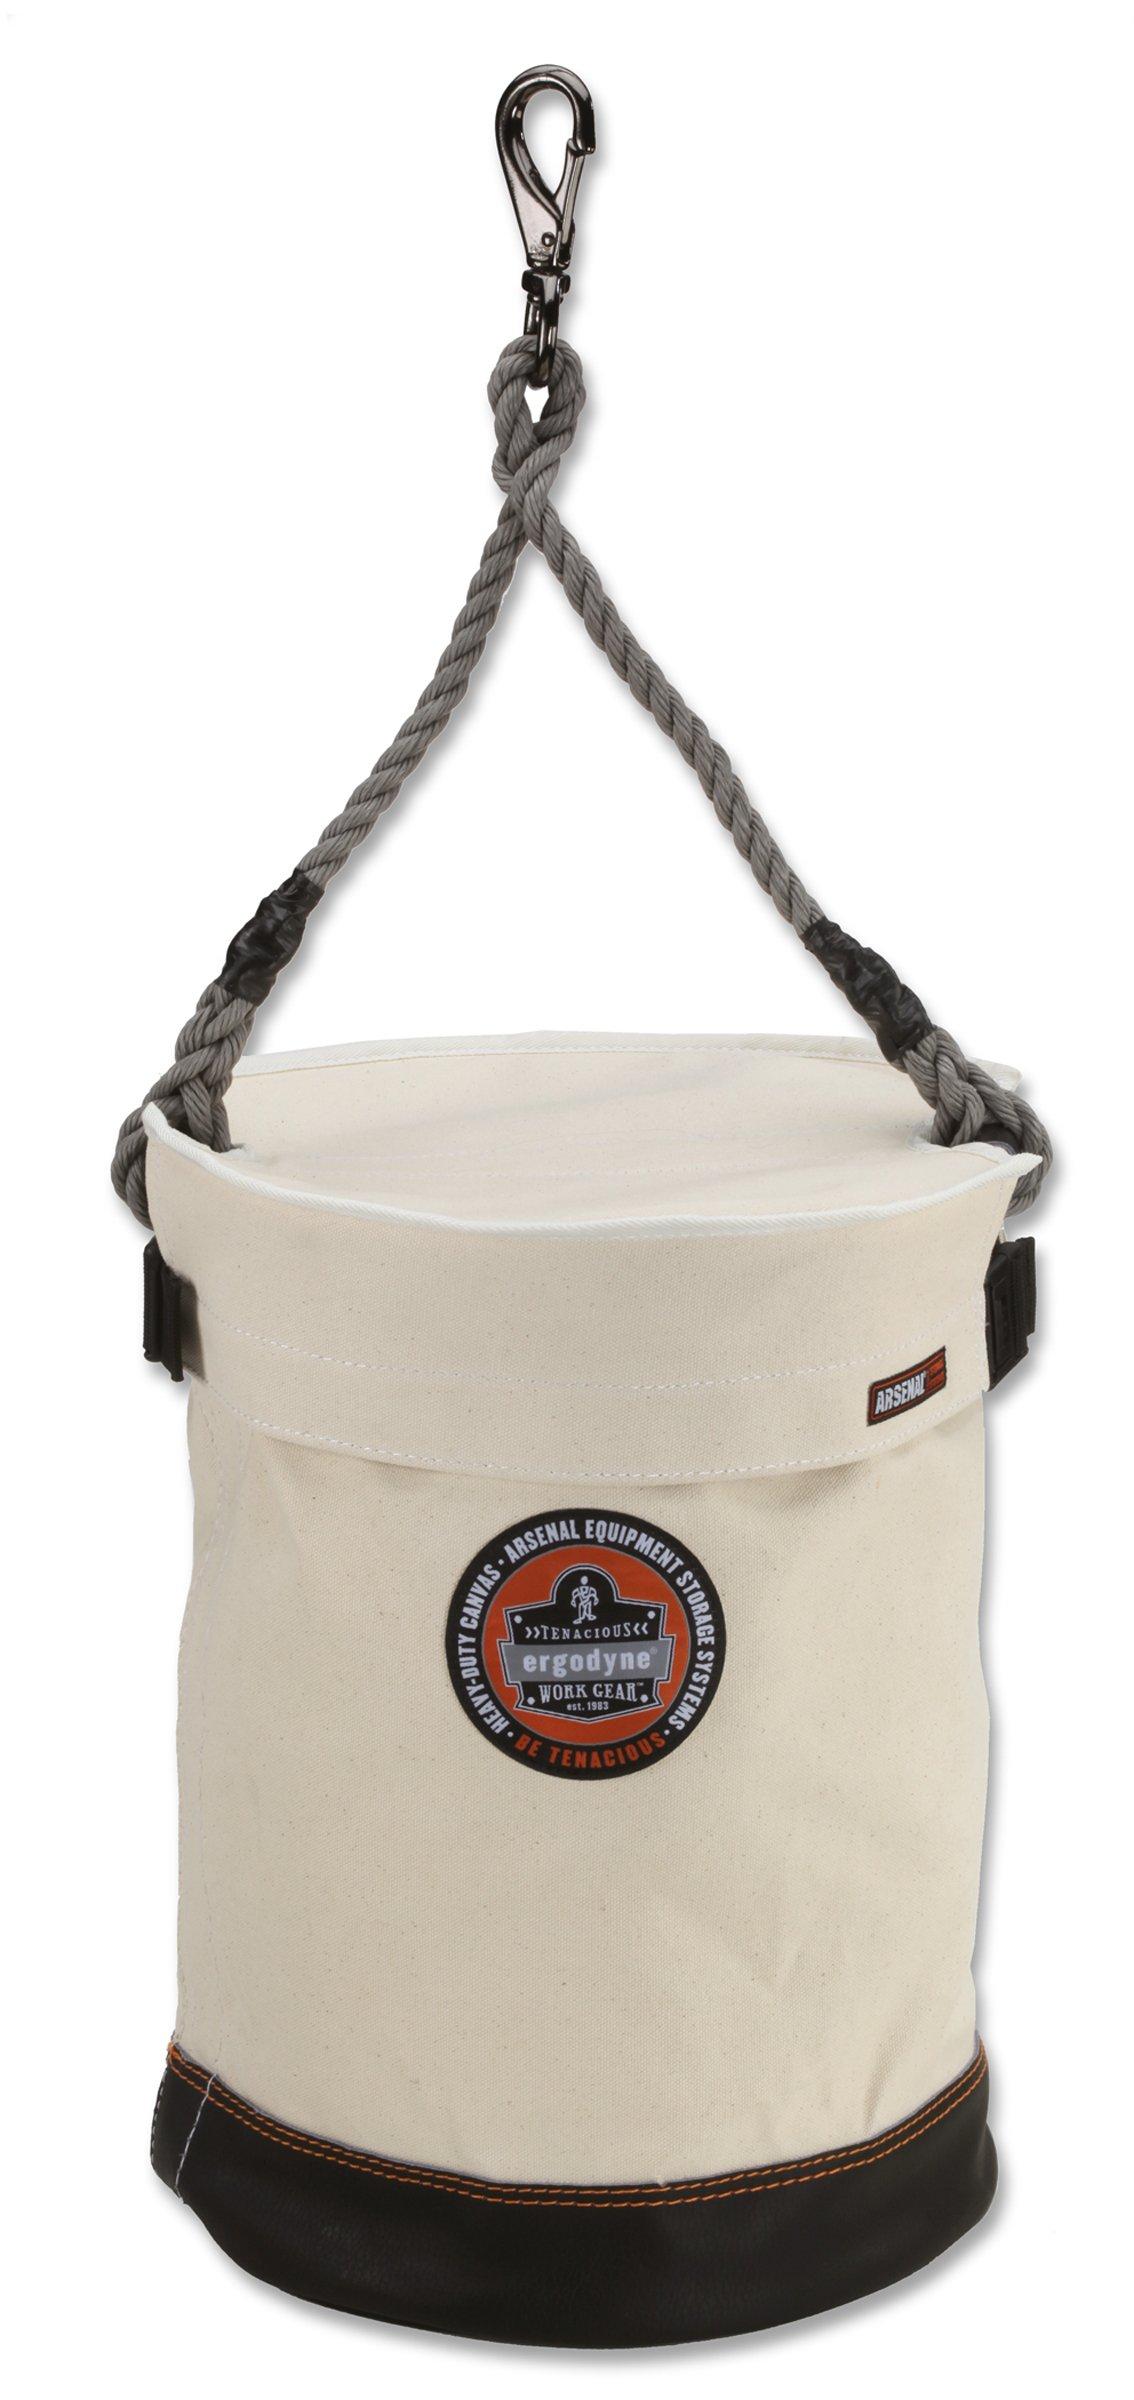 Ergodyne Arsenal 5740T Leather Bottom Tool Bucket with Cover, 12.5''D, 17''H by Ergodyne (Image #1)